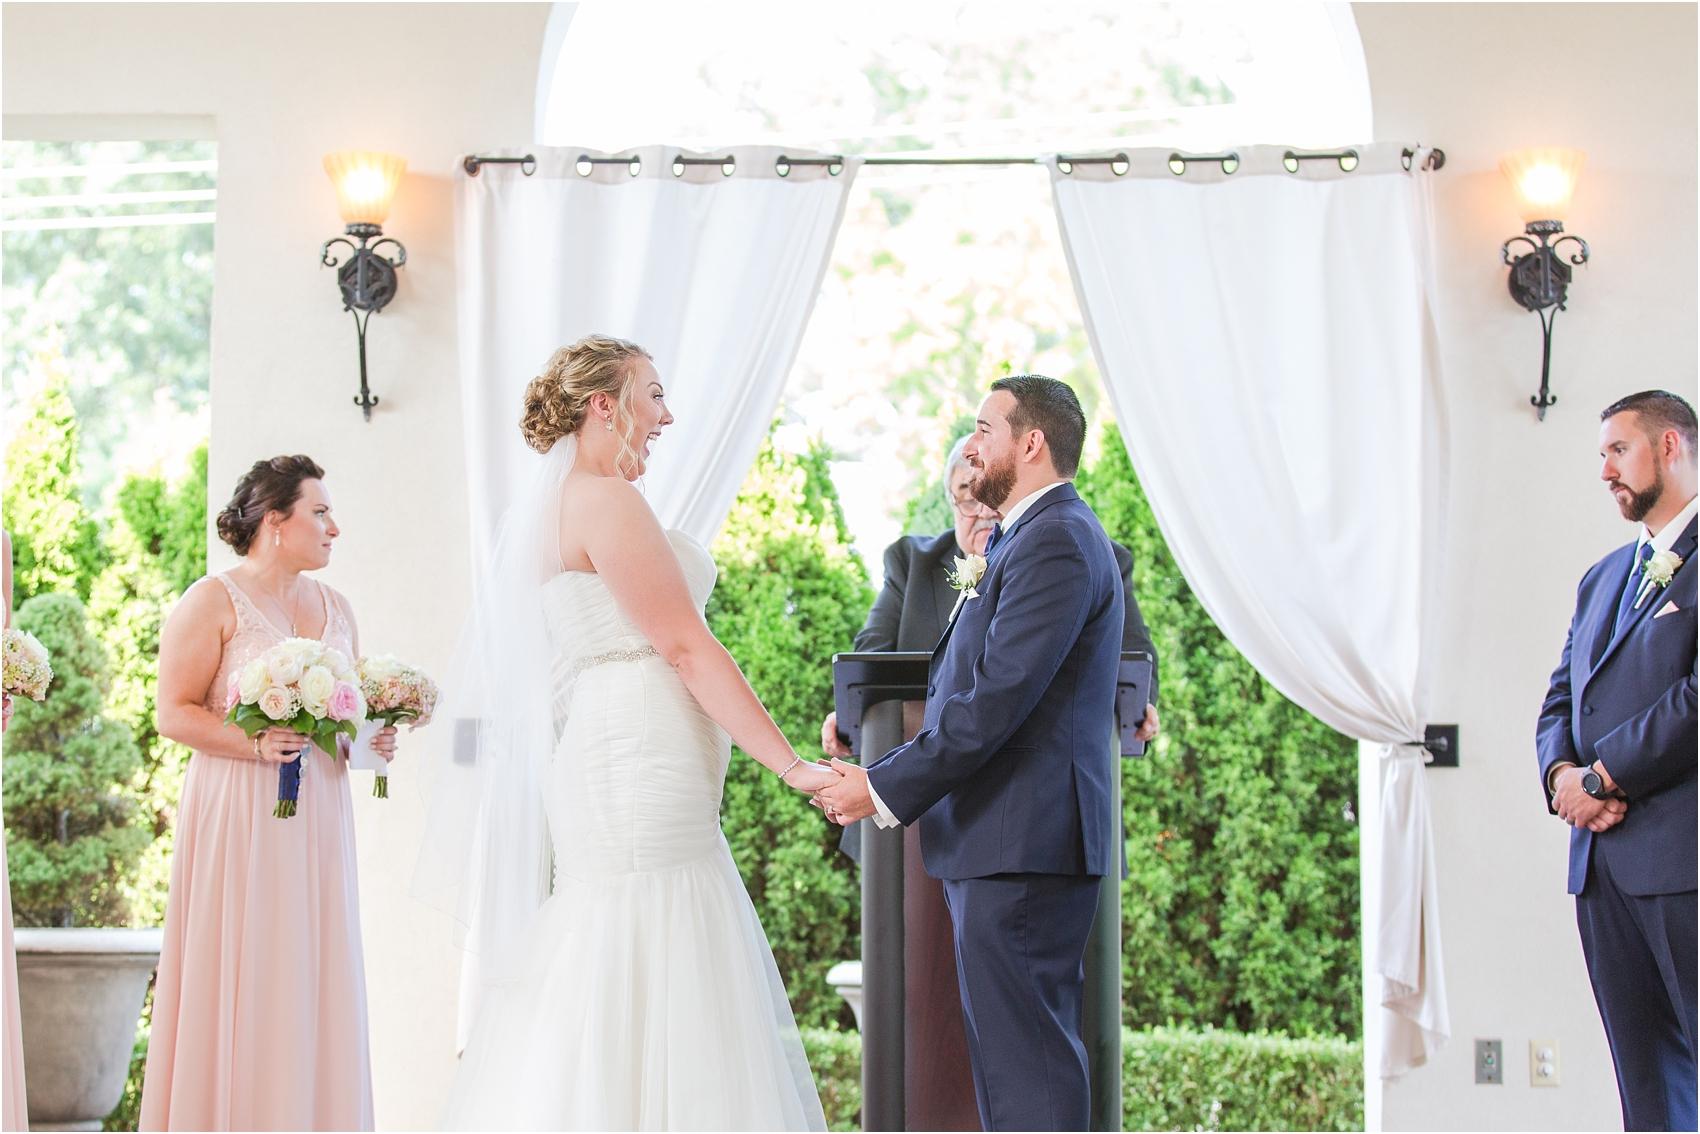 joyful-and-candid-navy-blush-wedding-photos-at-crystal-gardens-in-howell-mi-by-courtney-carolyn-photography_0052.jpg